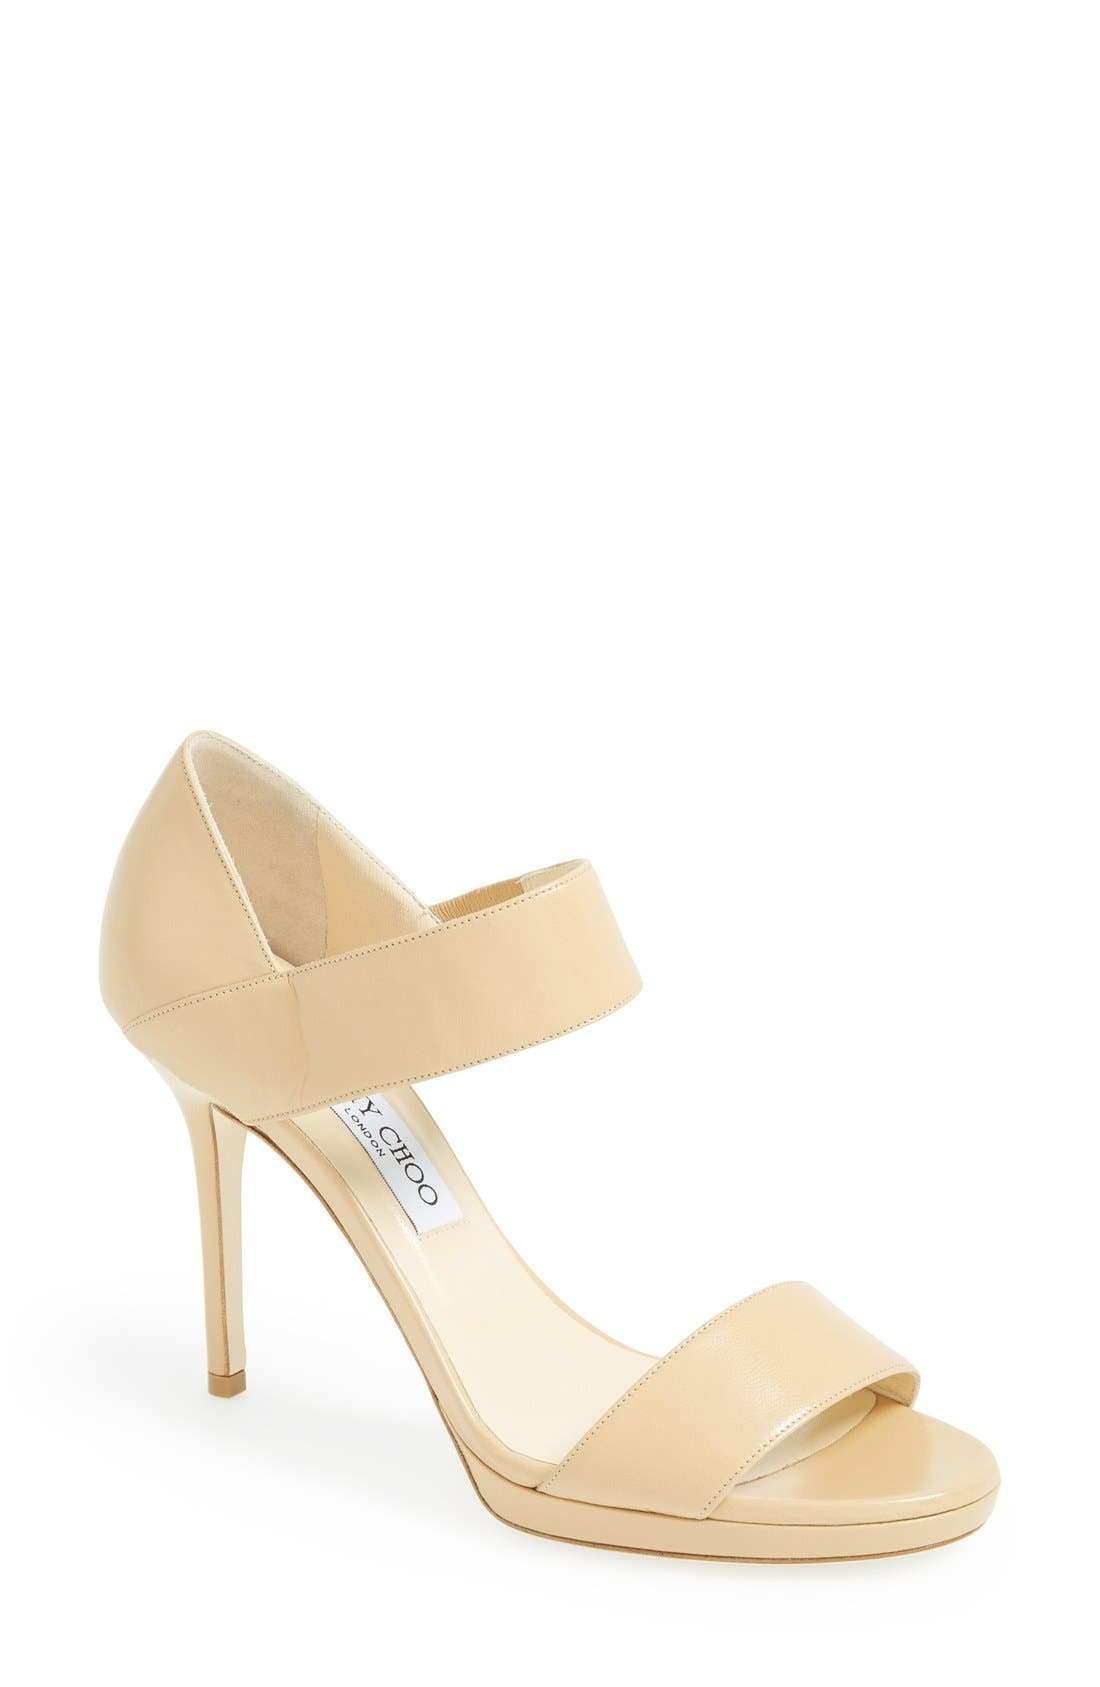 Alternate Image 1 Selected - Jimmy Choo 'Alana' Platform Sandal (Women)